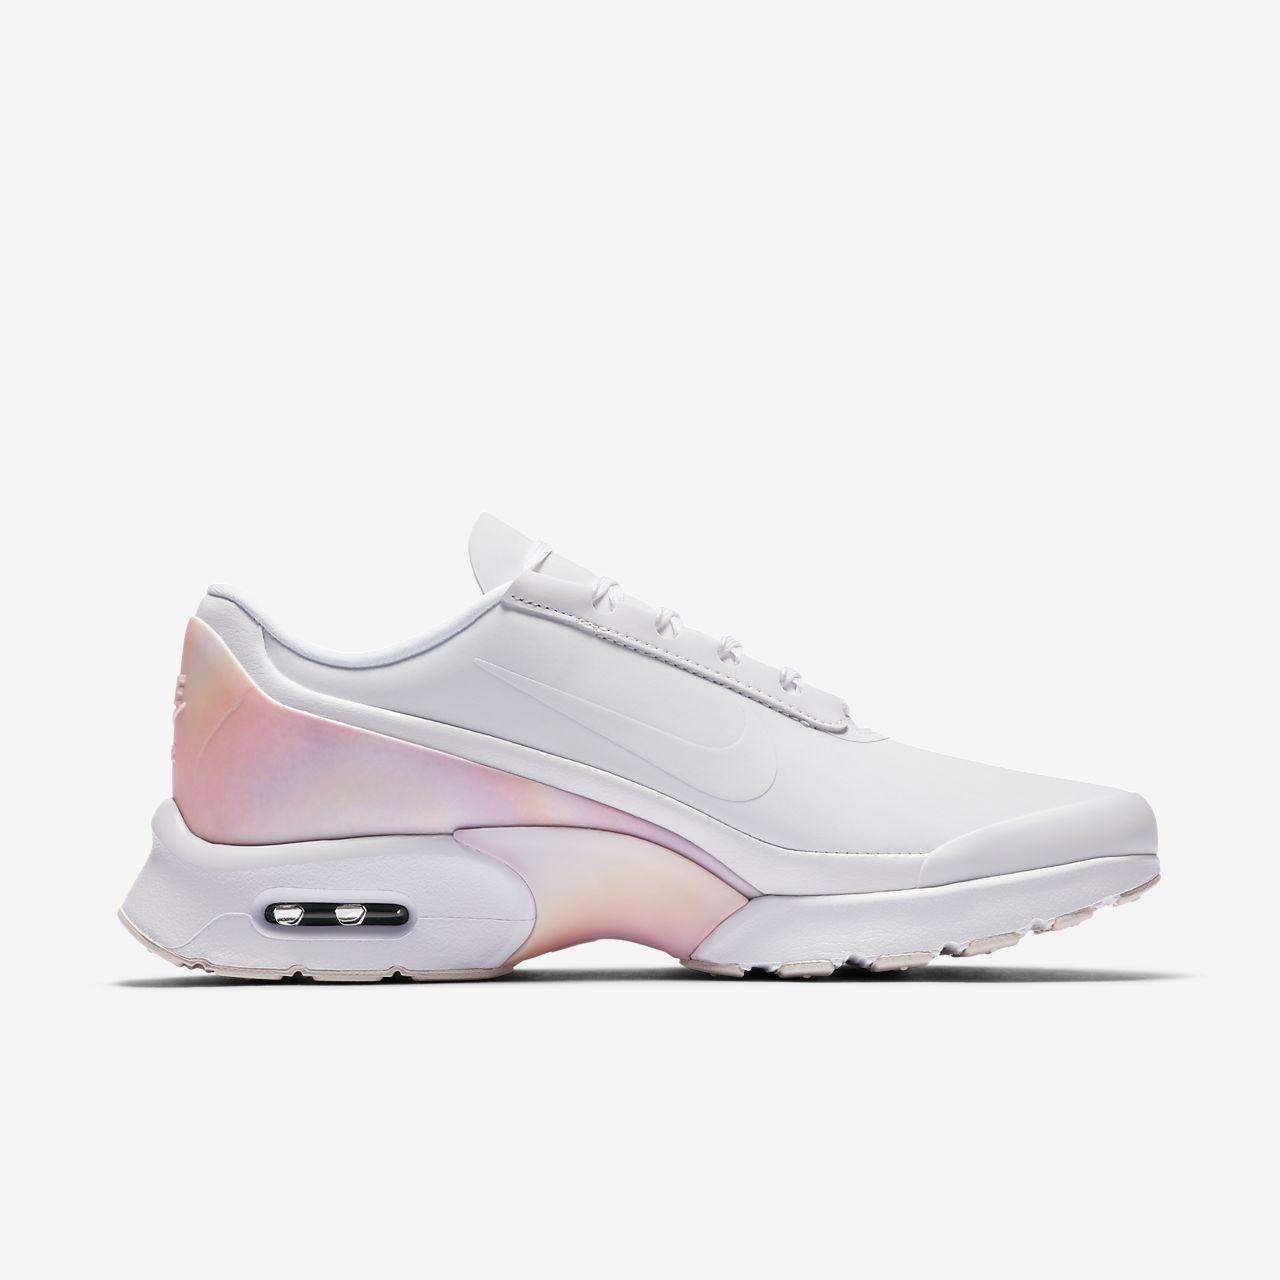 Chaussures De Sport En Cuir Air Max De Nike Jewell LLvtK